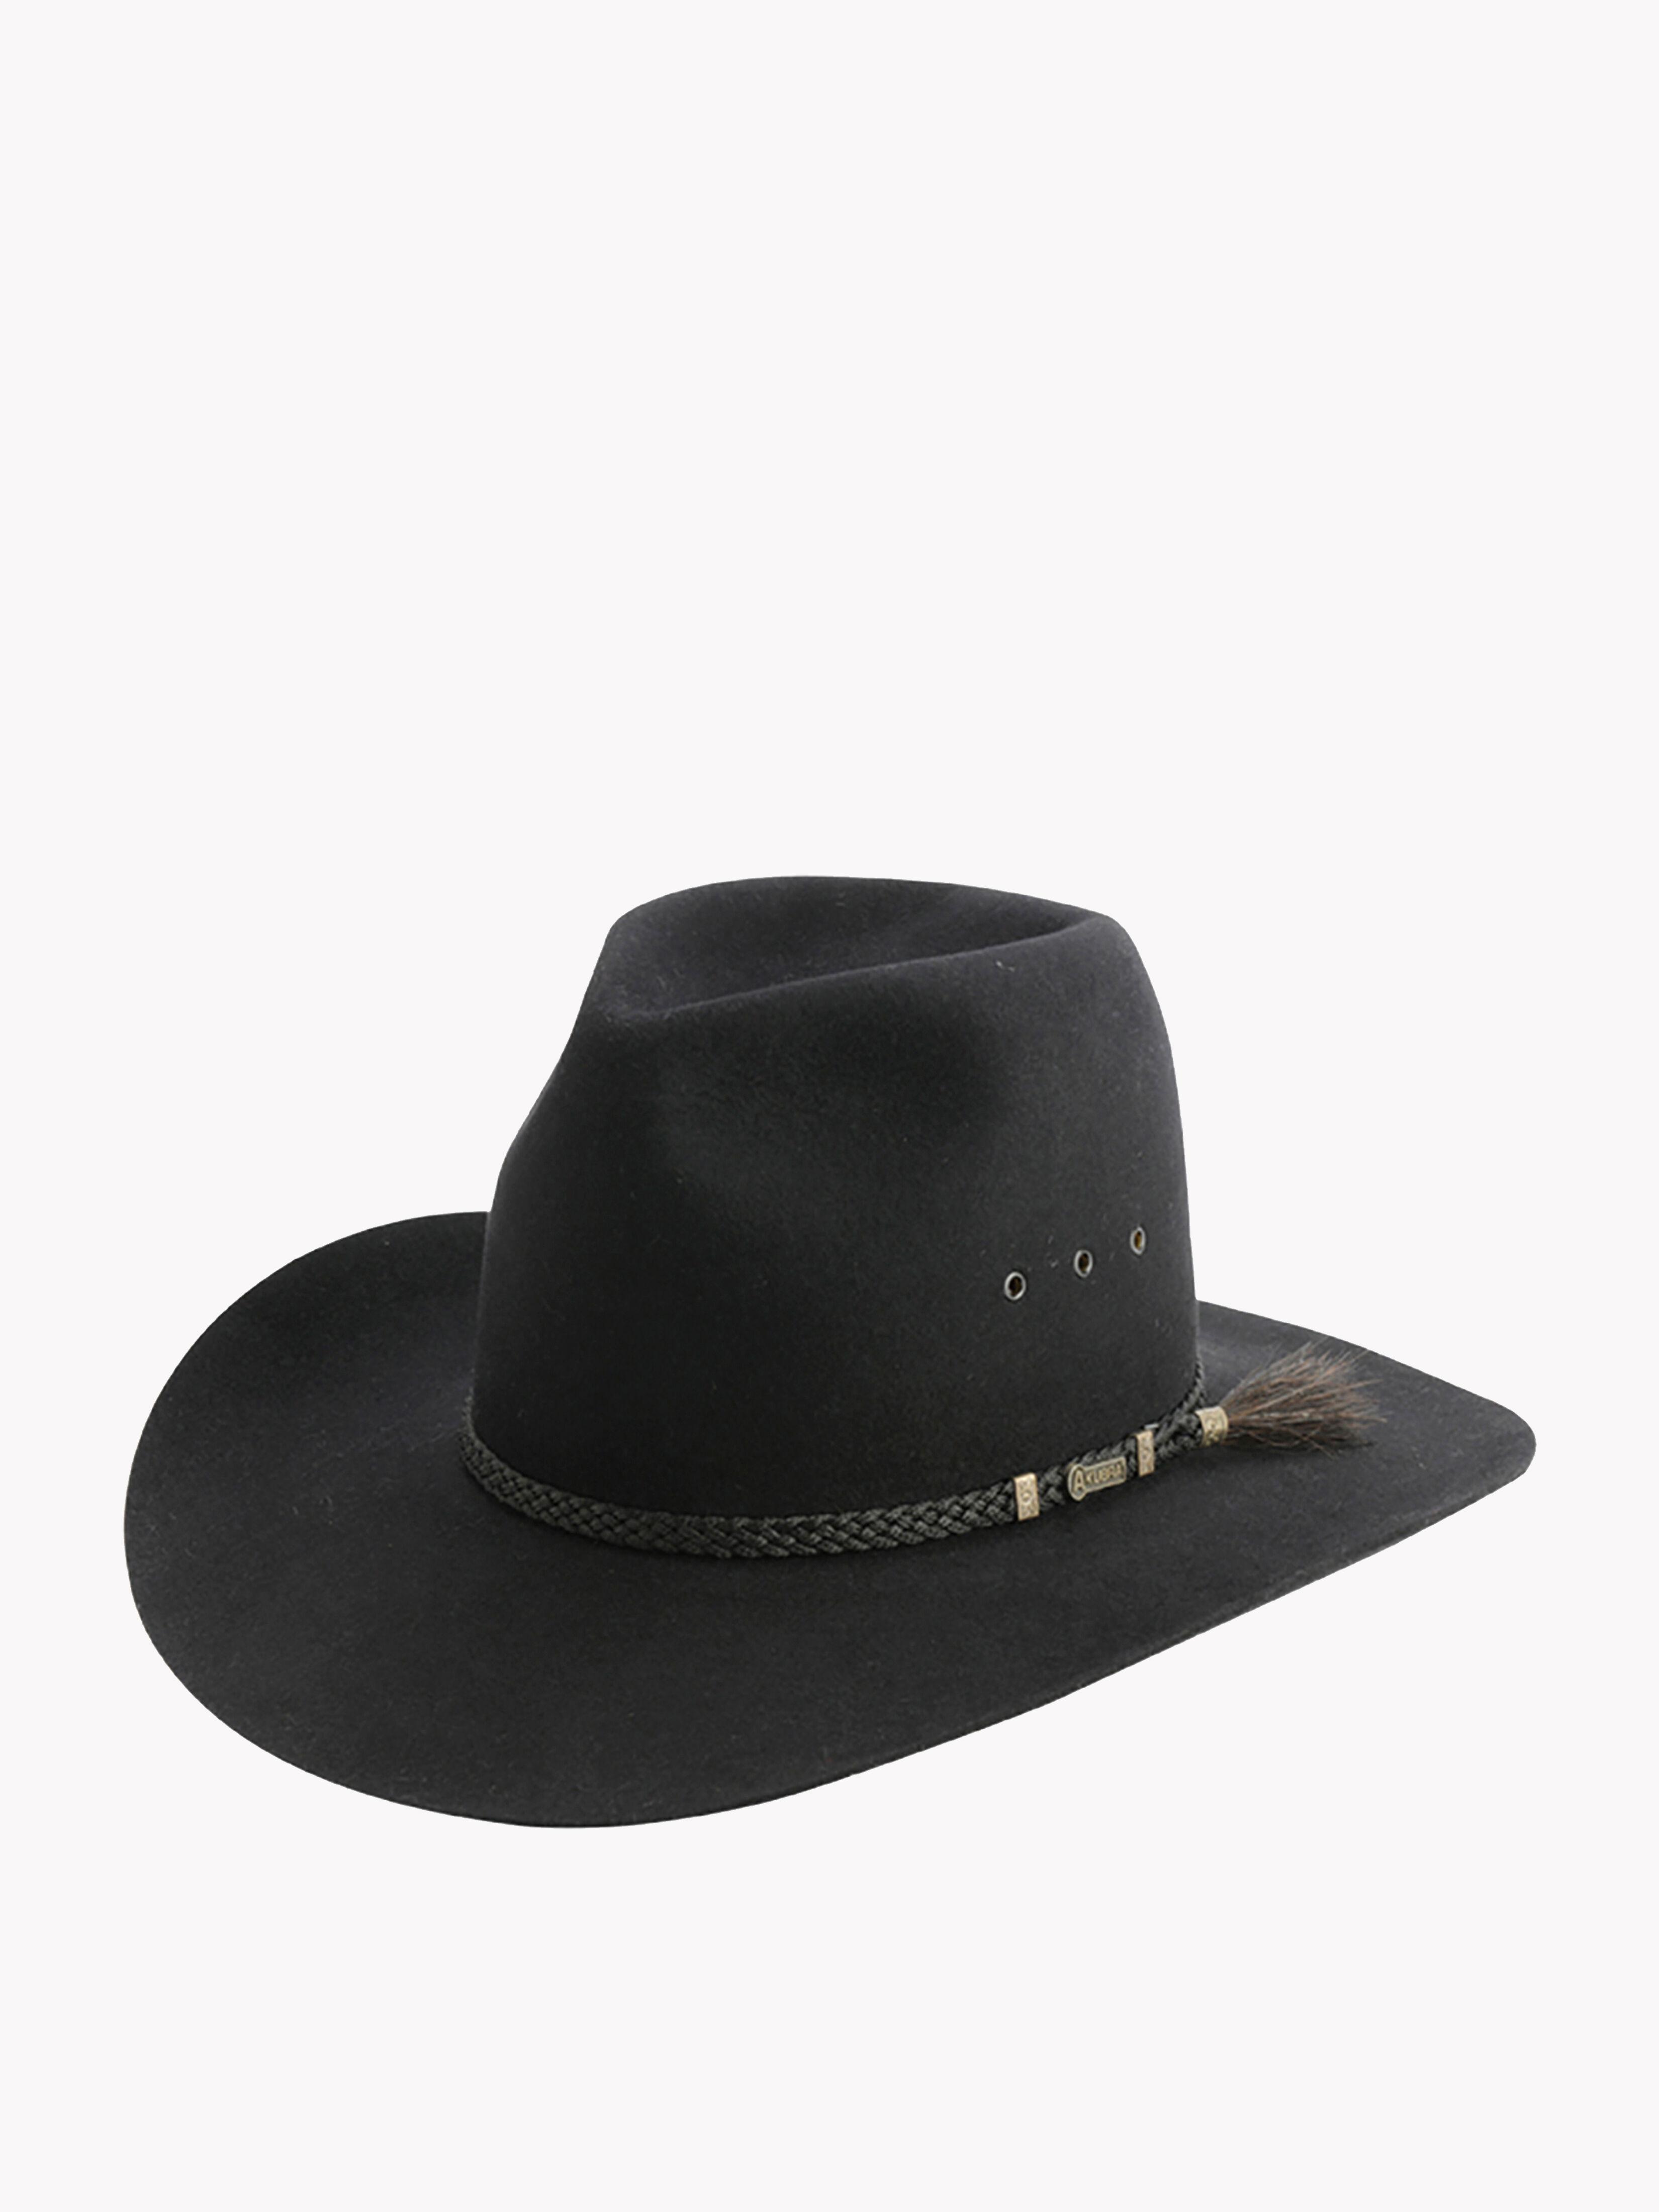 Akubra Longhorn Hat Hats Caps At R M Williams